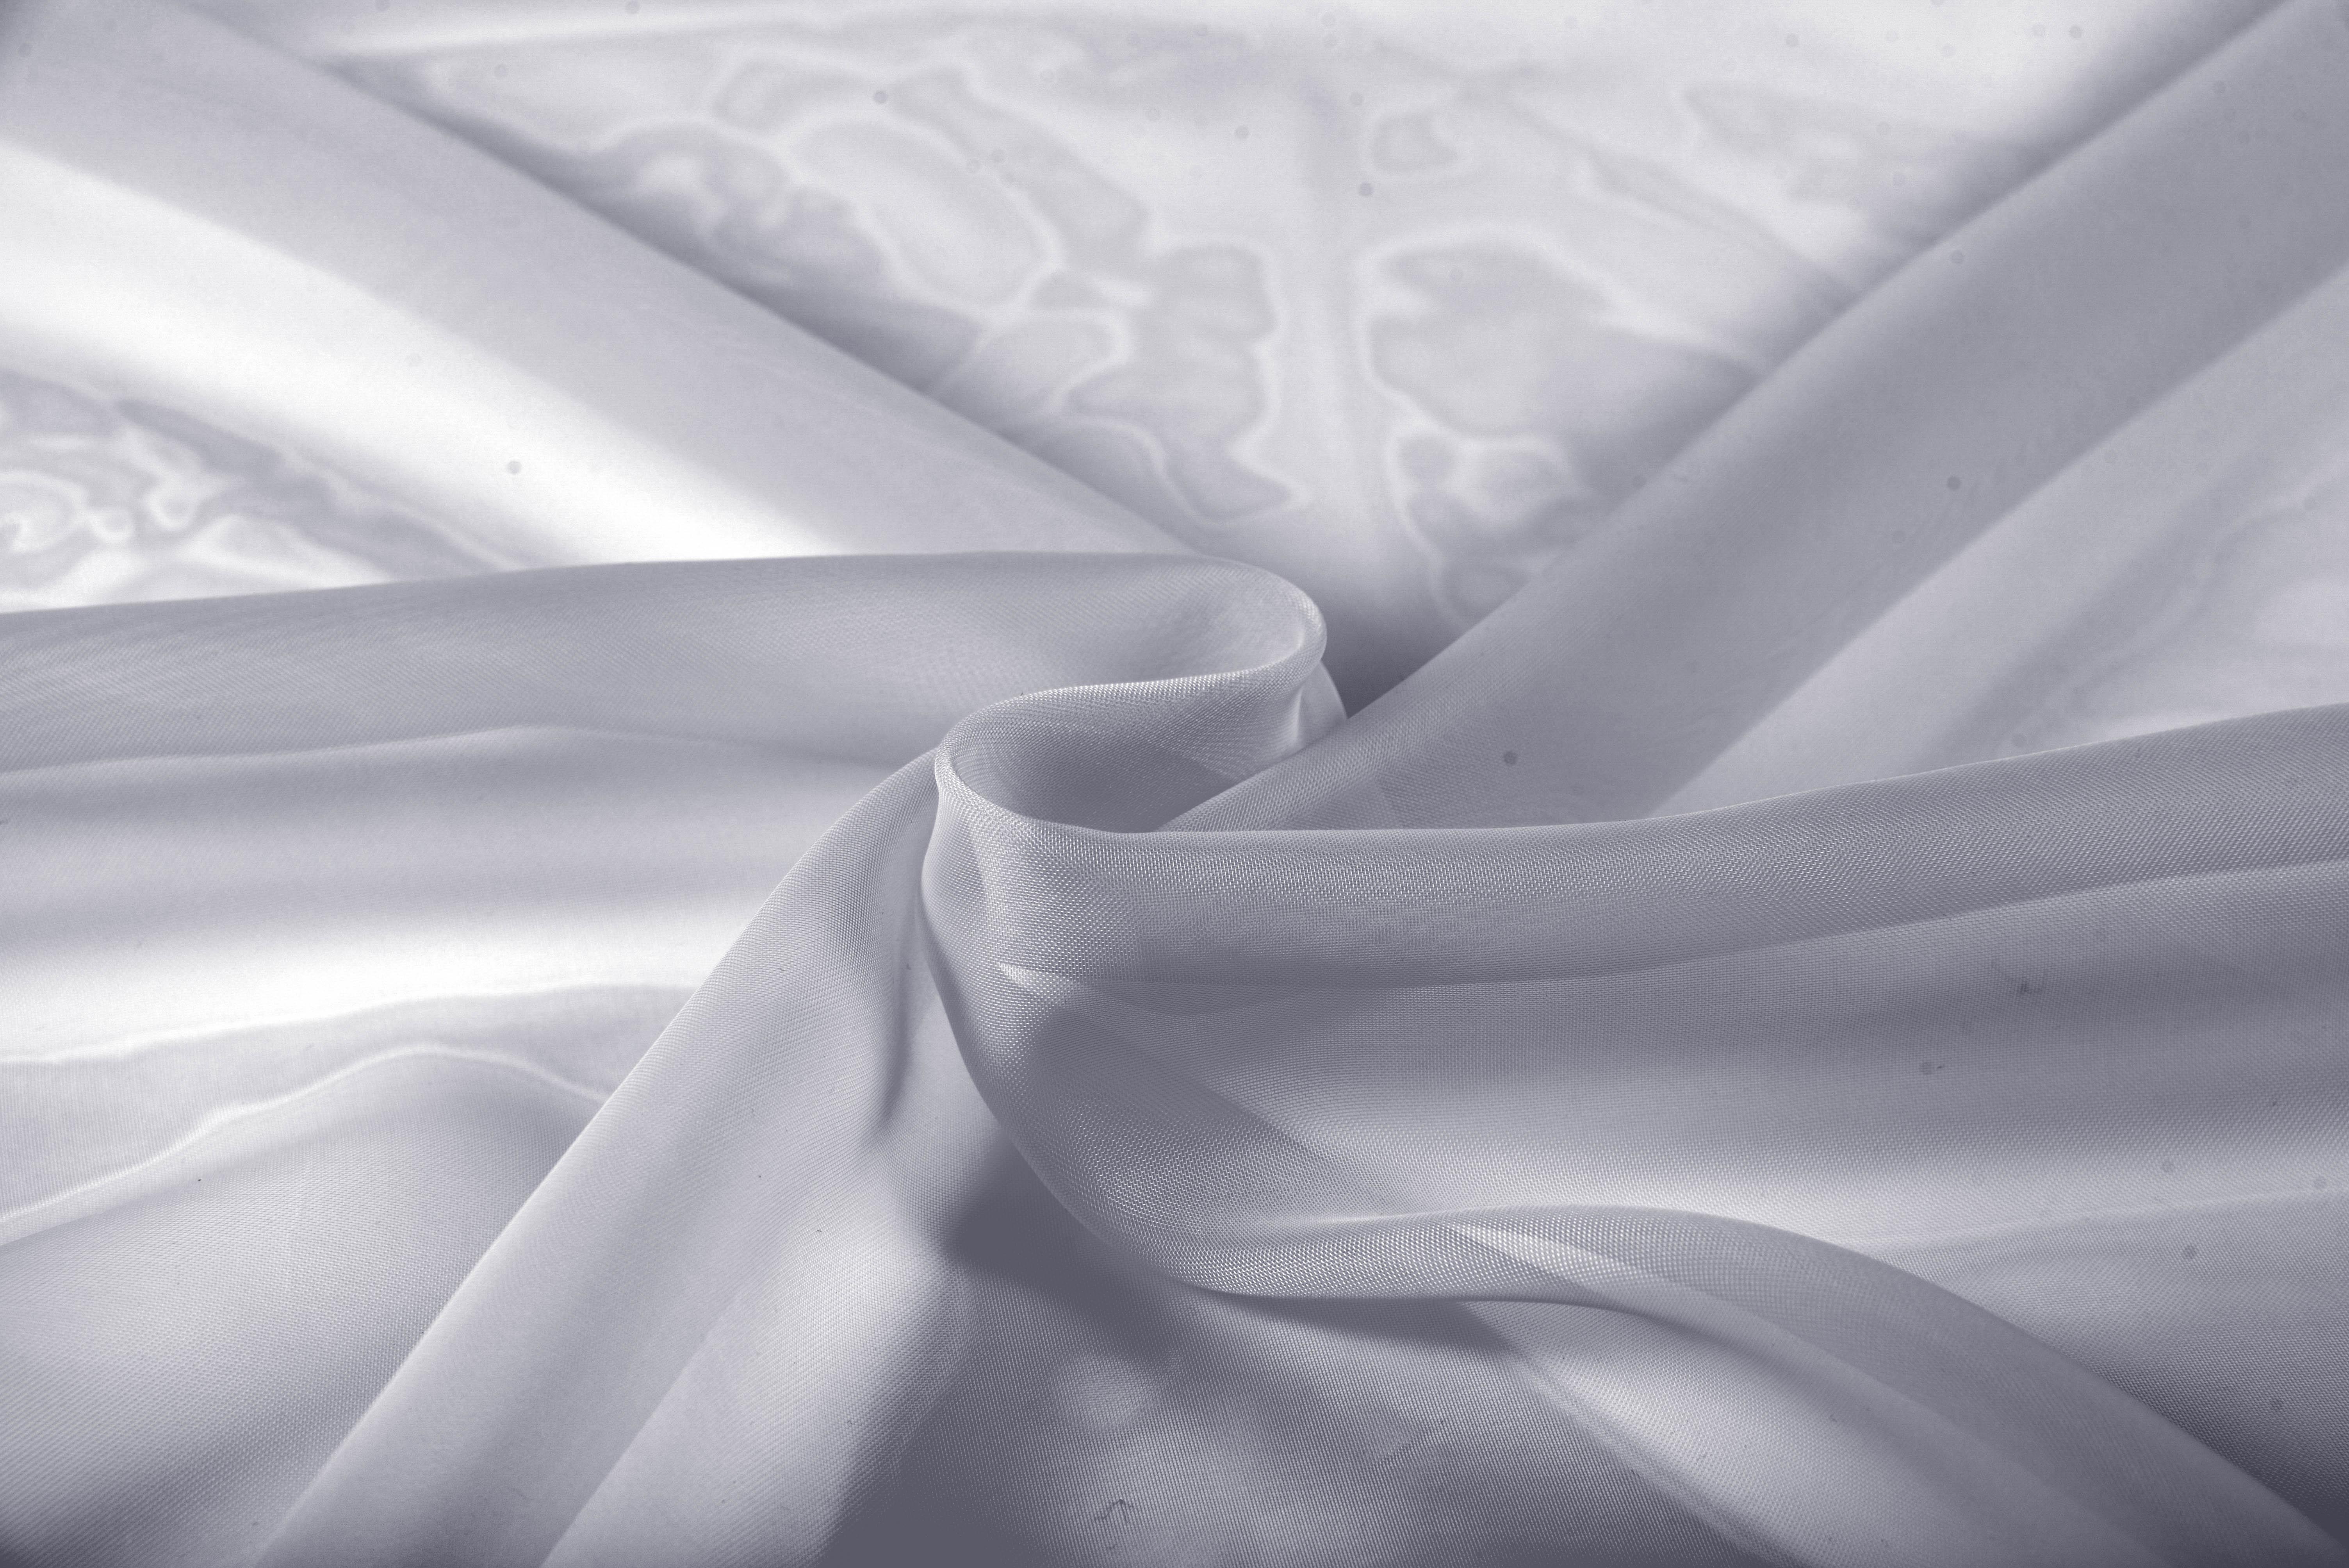 {} TexRepublic Материал Вуаль Palette Цвет: Серый серый вислоухий котнок цена